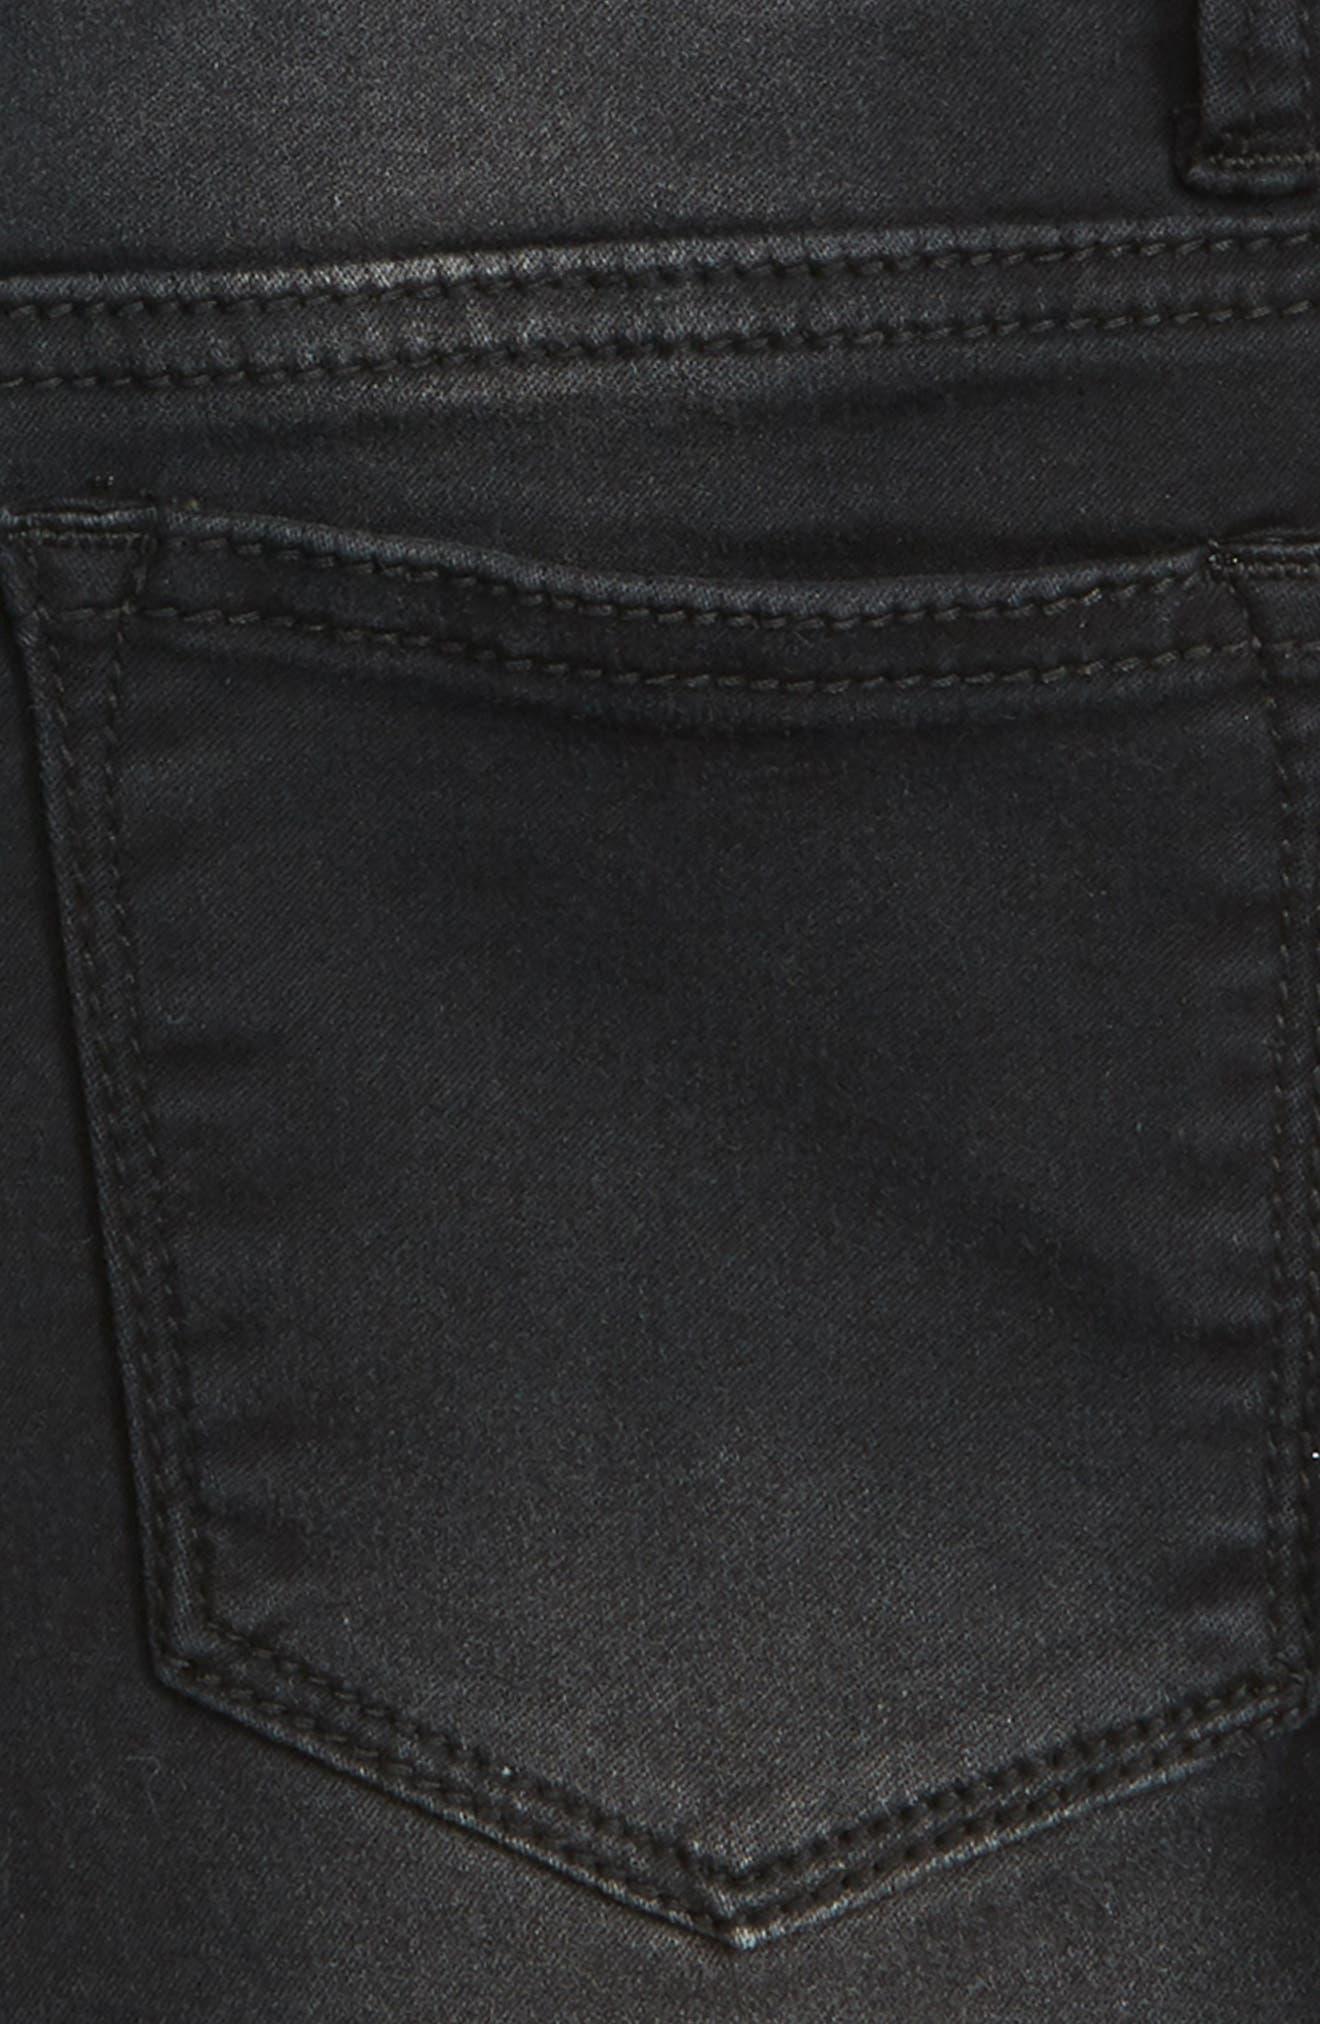 Lace Trim Frayed Denim Shorts,                             Alternate thumbnail 3, color,                             Jet